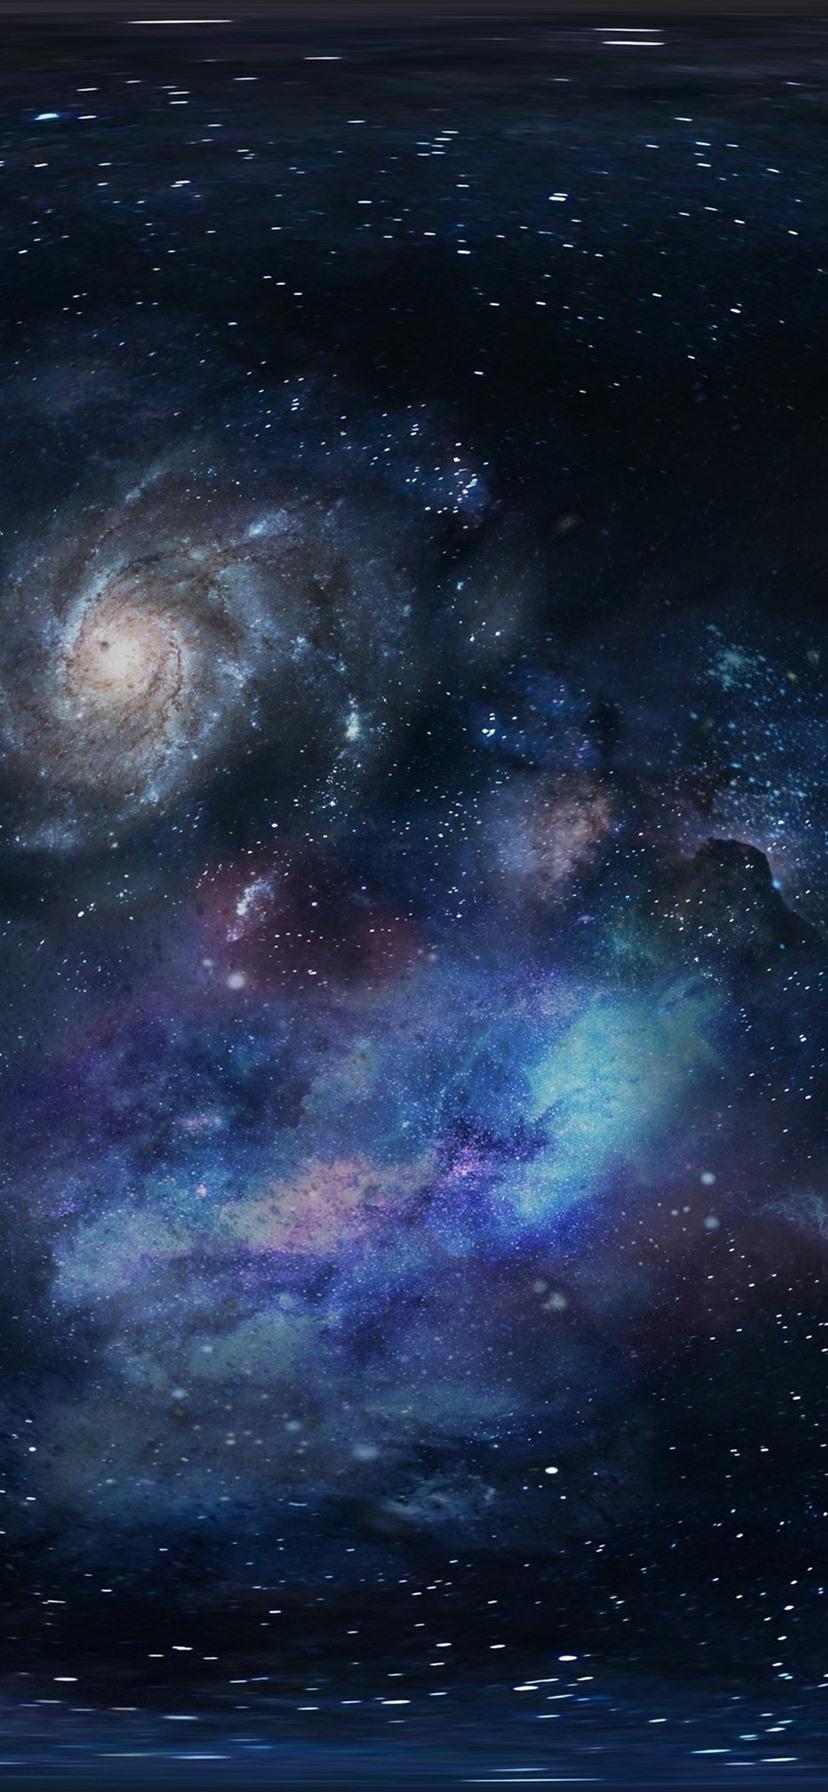 Galaxy universe space